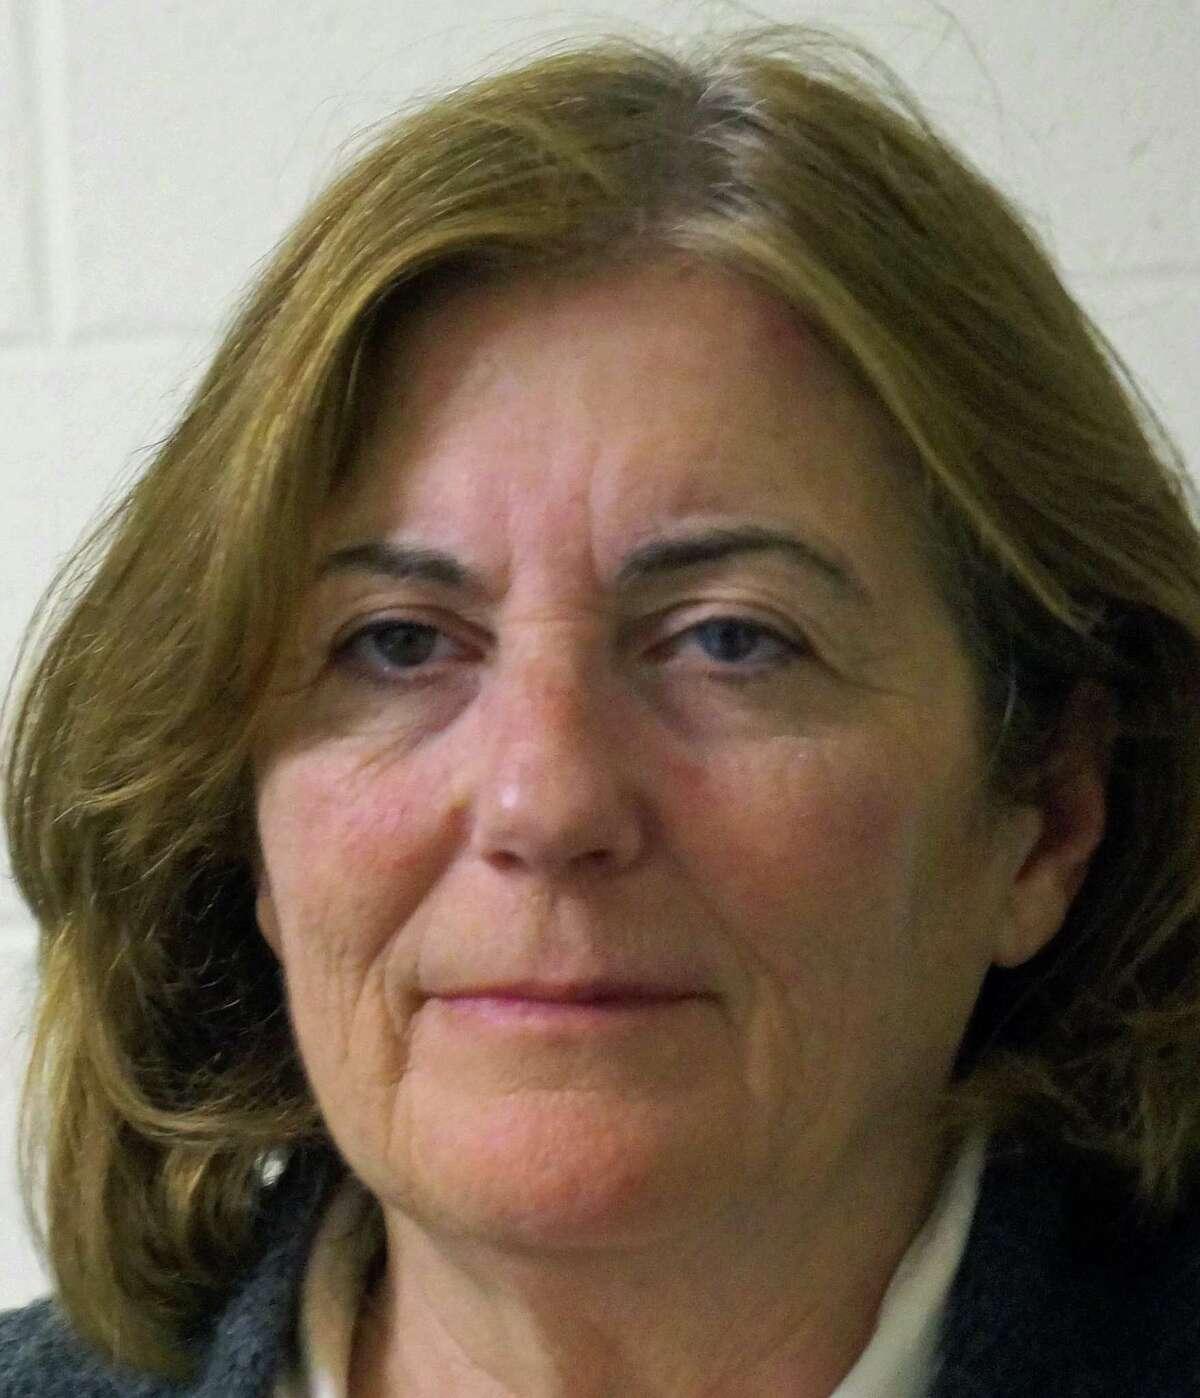 Genevieve Reilly, Connecticut Post and Fairfield Citizen News reporter